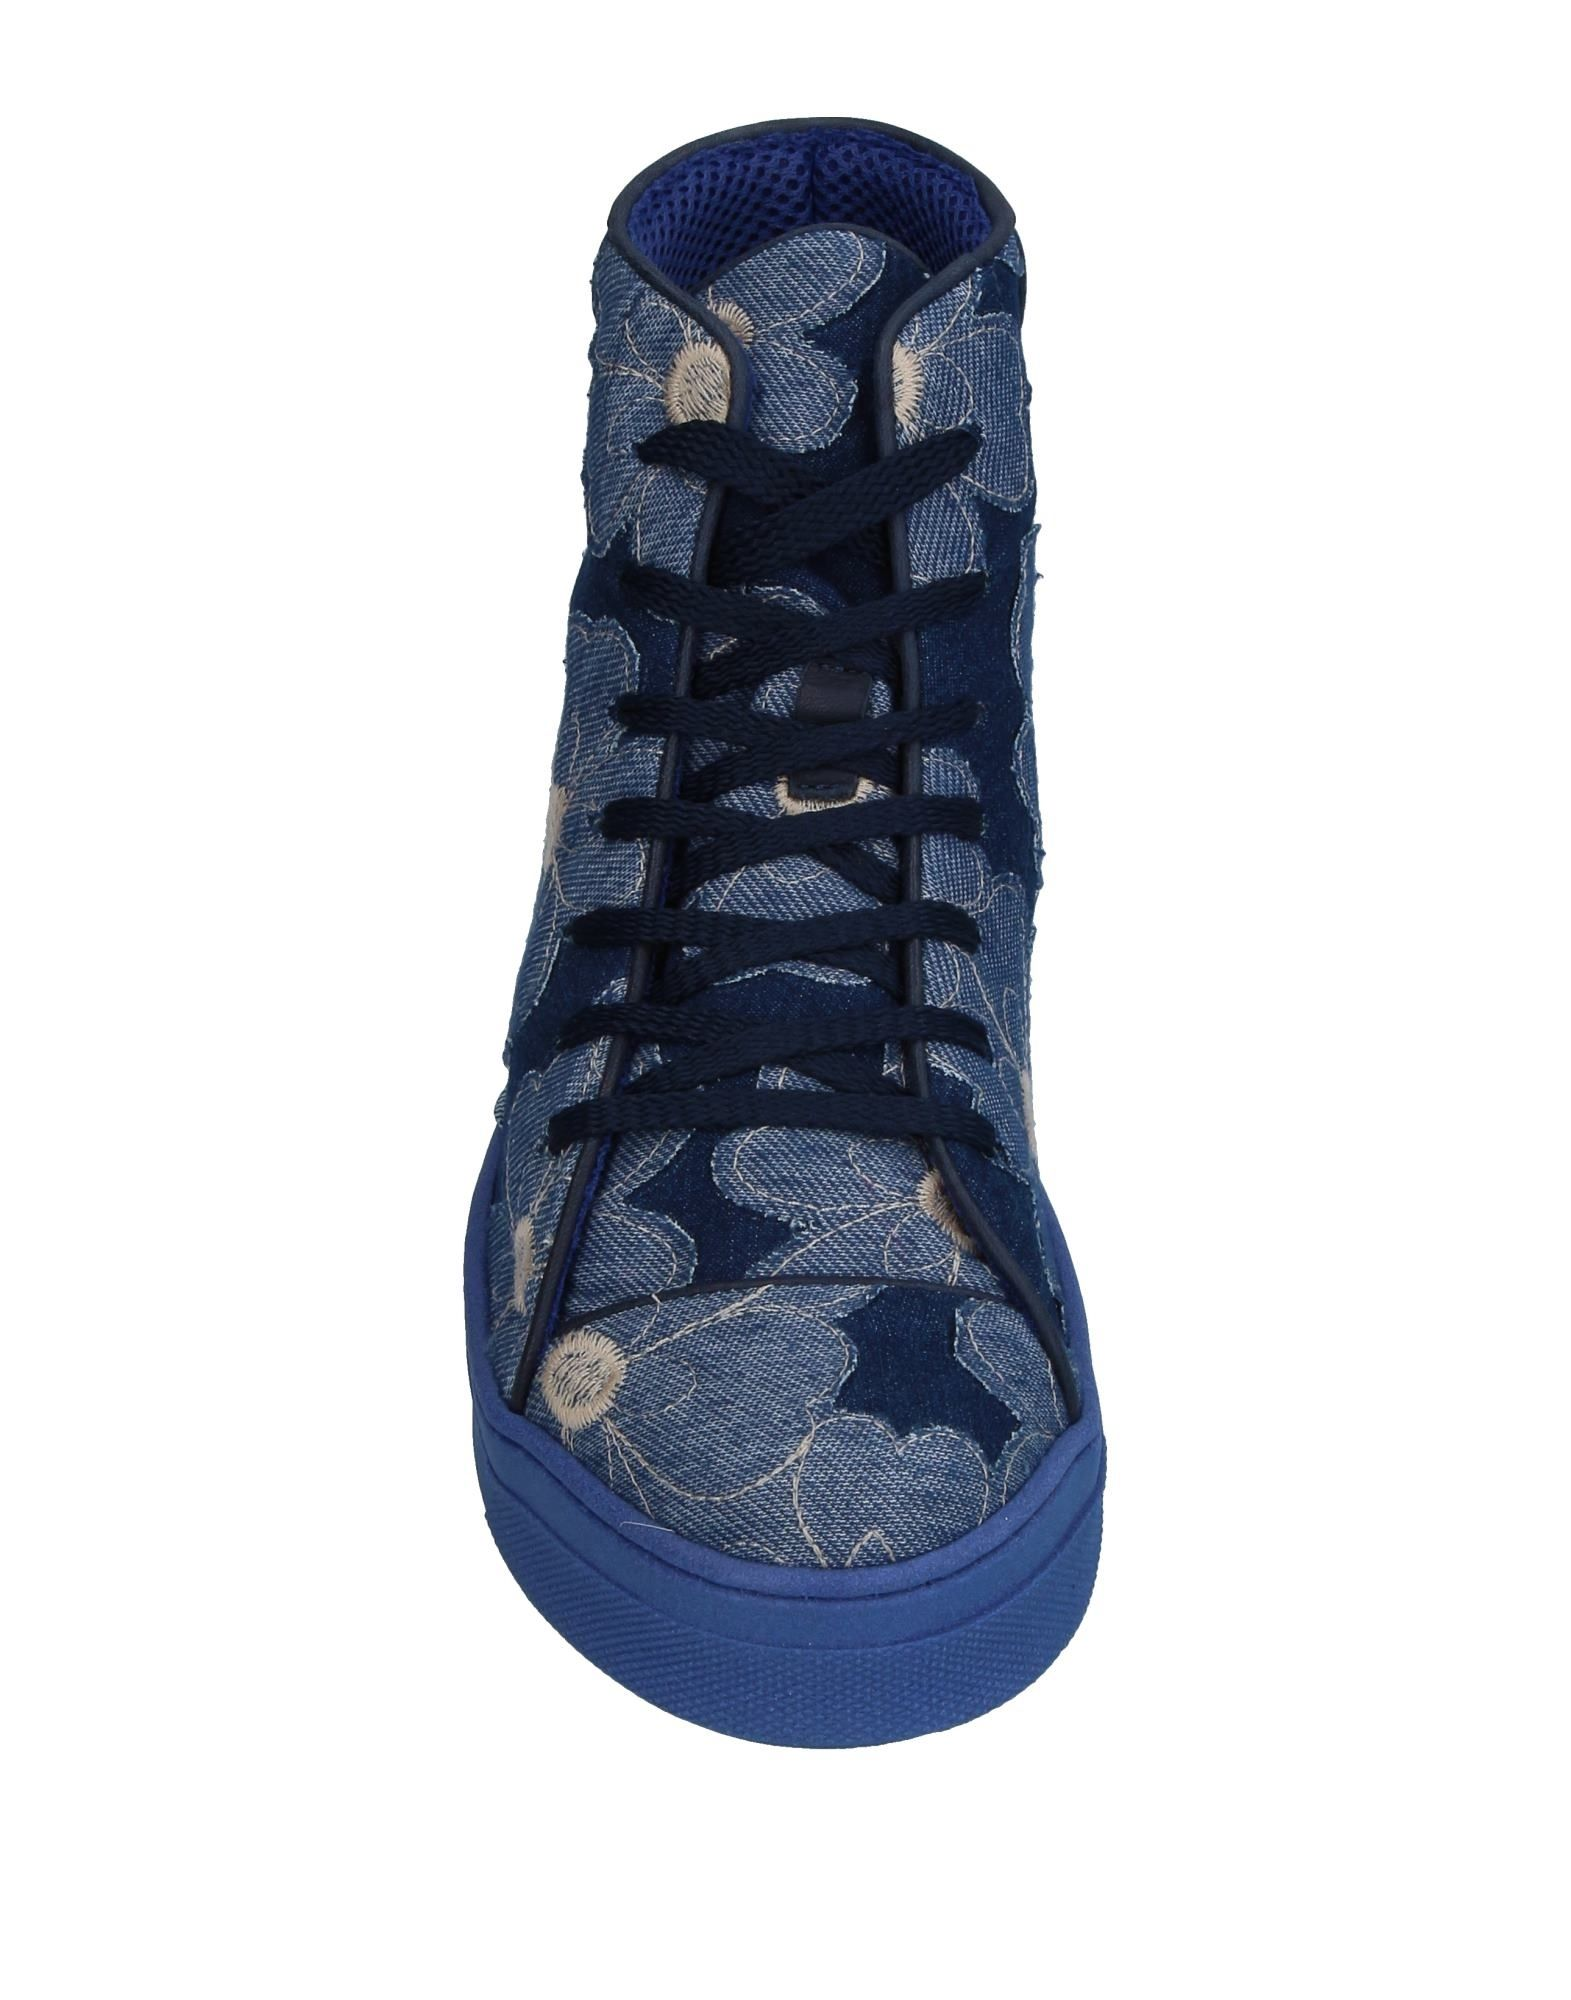 Sneakers Sgn Giancarlo Paoli Femme - Sneakers Sgn Giancarlo Paoli sur